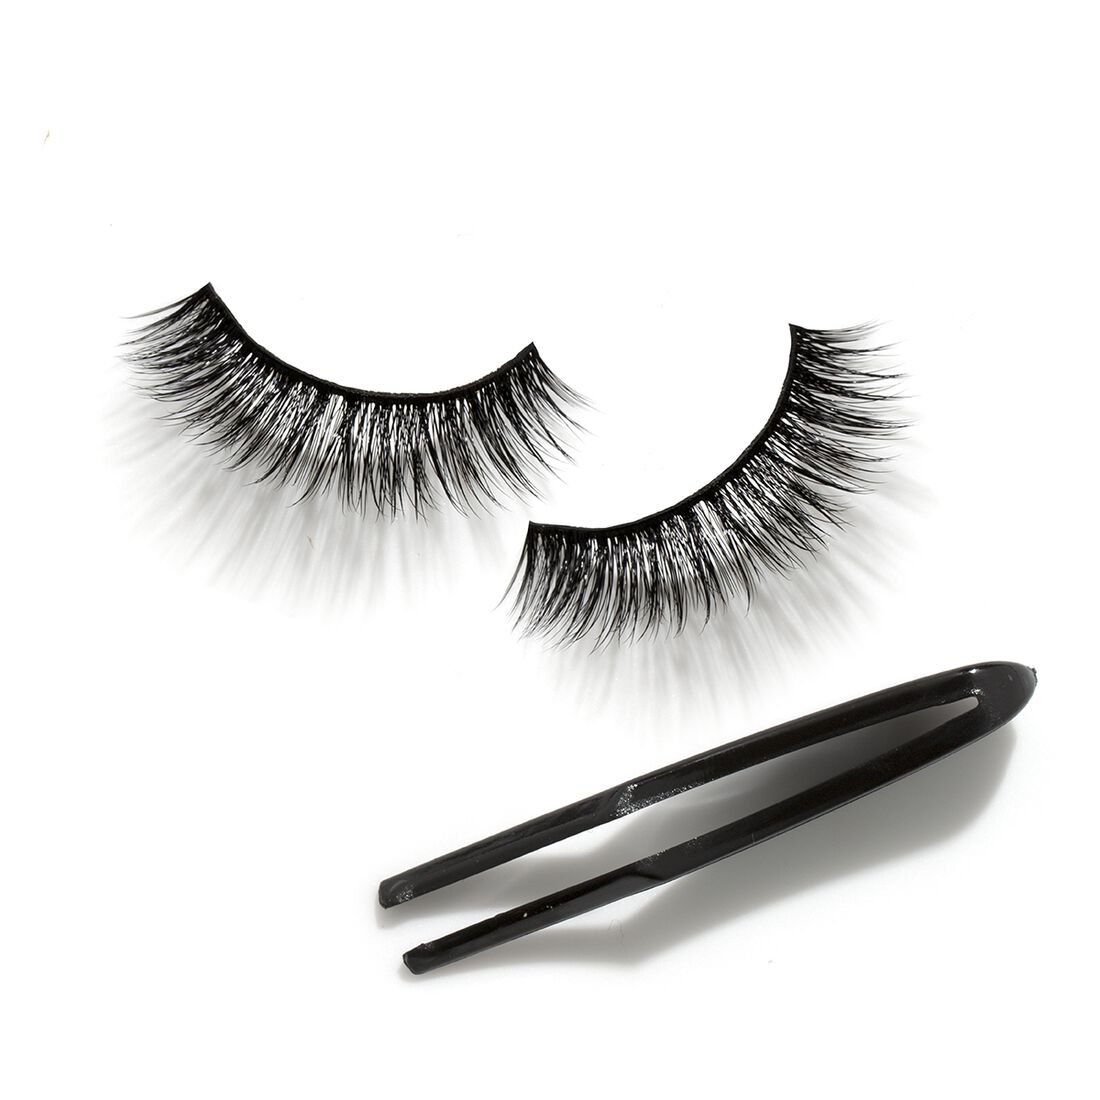 ELF Cosmetics Weylie x e.l.f. Luxe Lash Kit 2.0